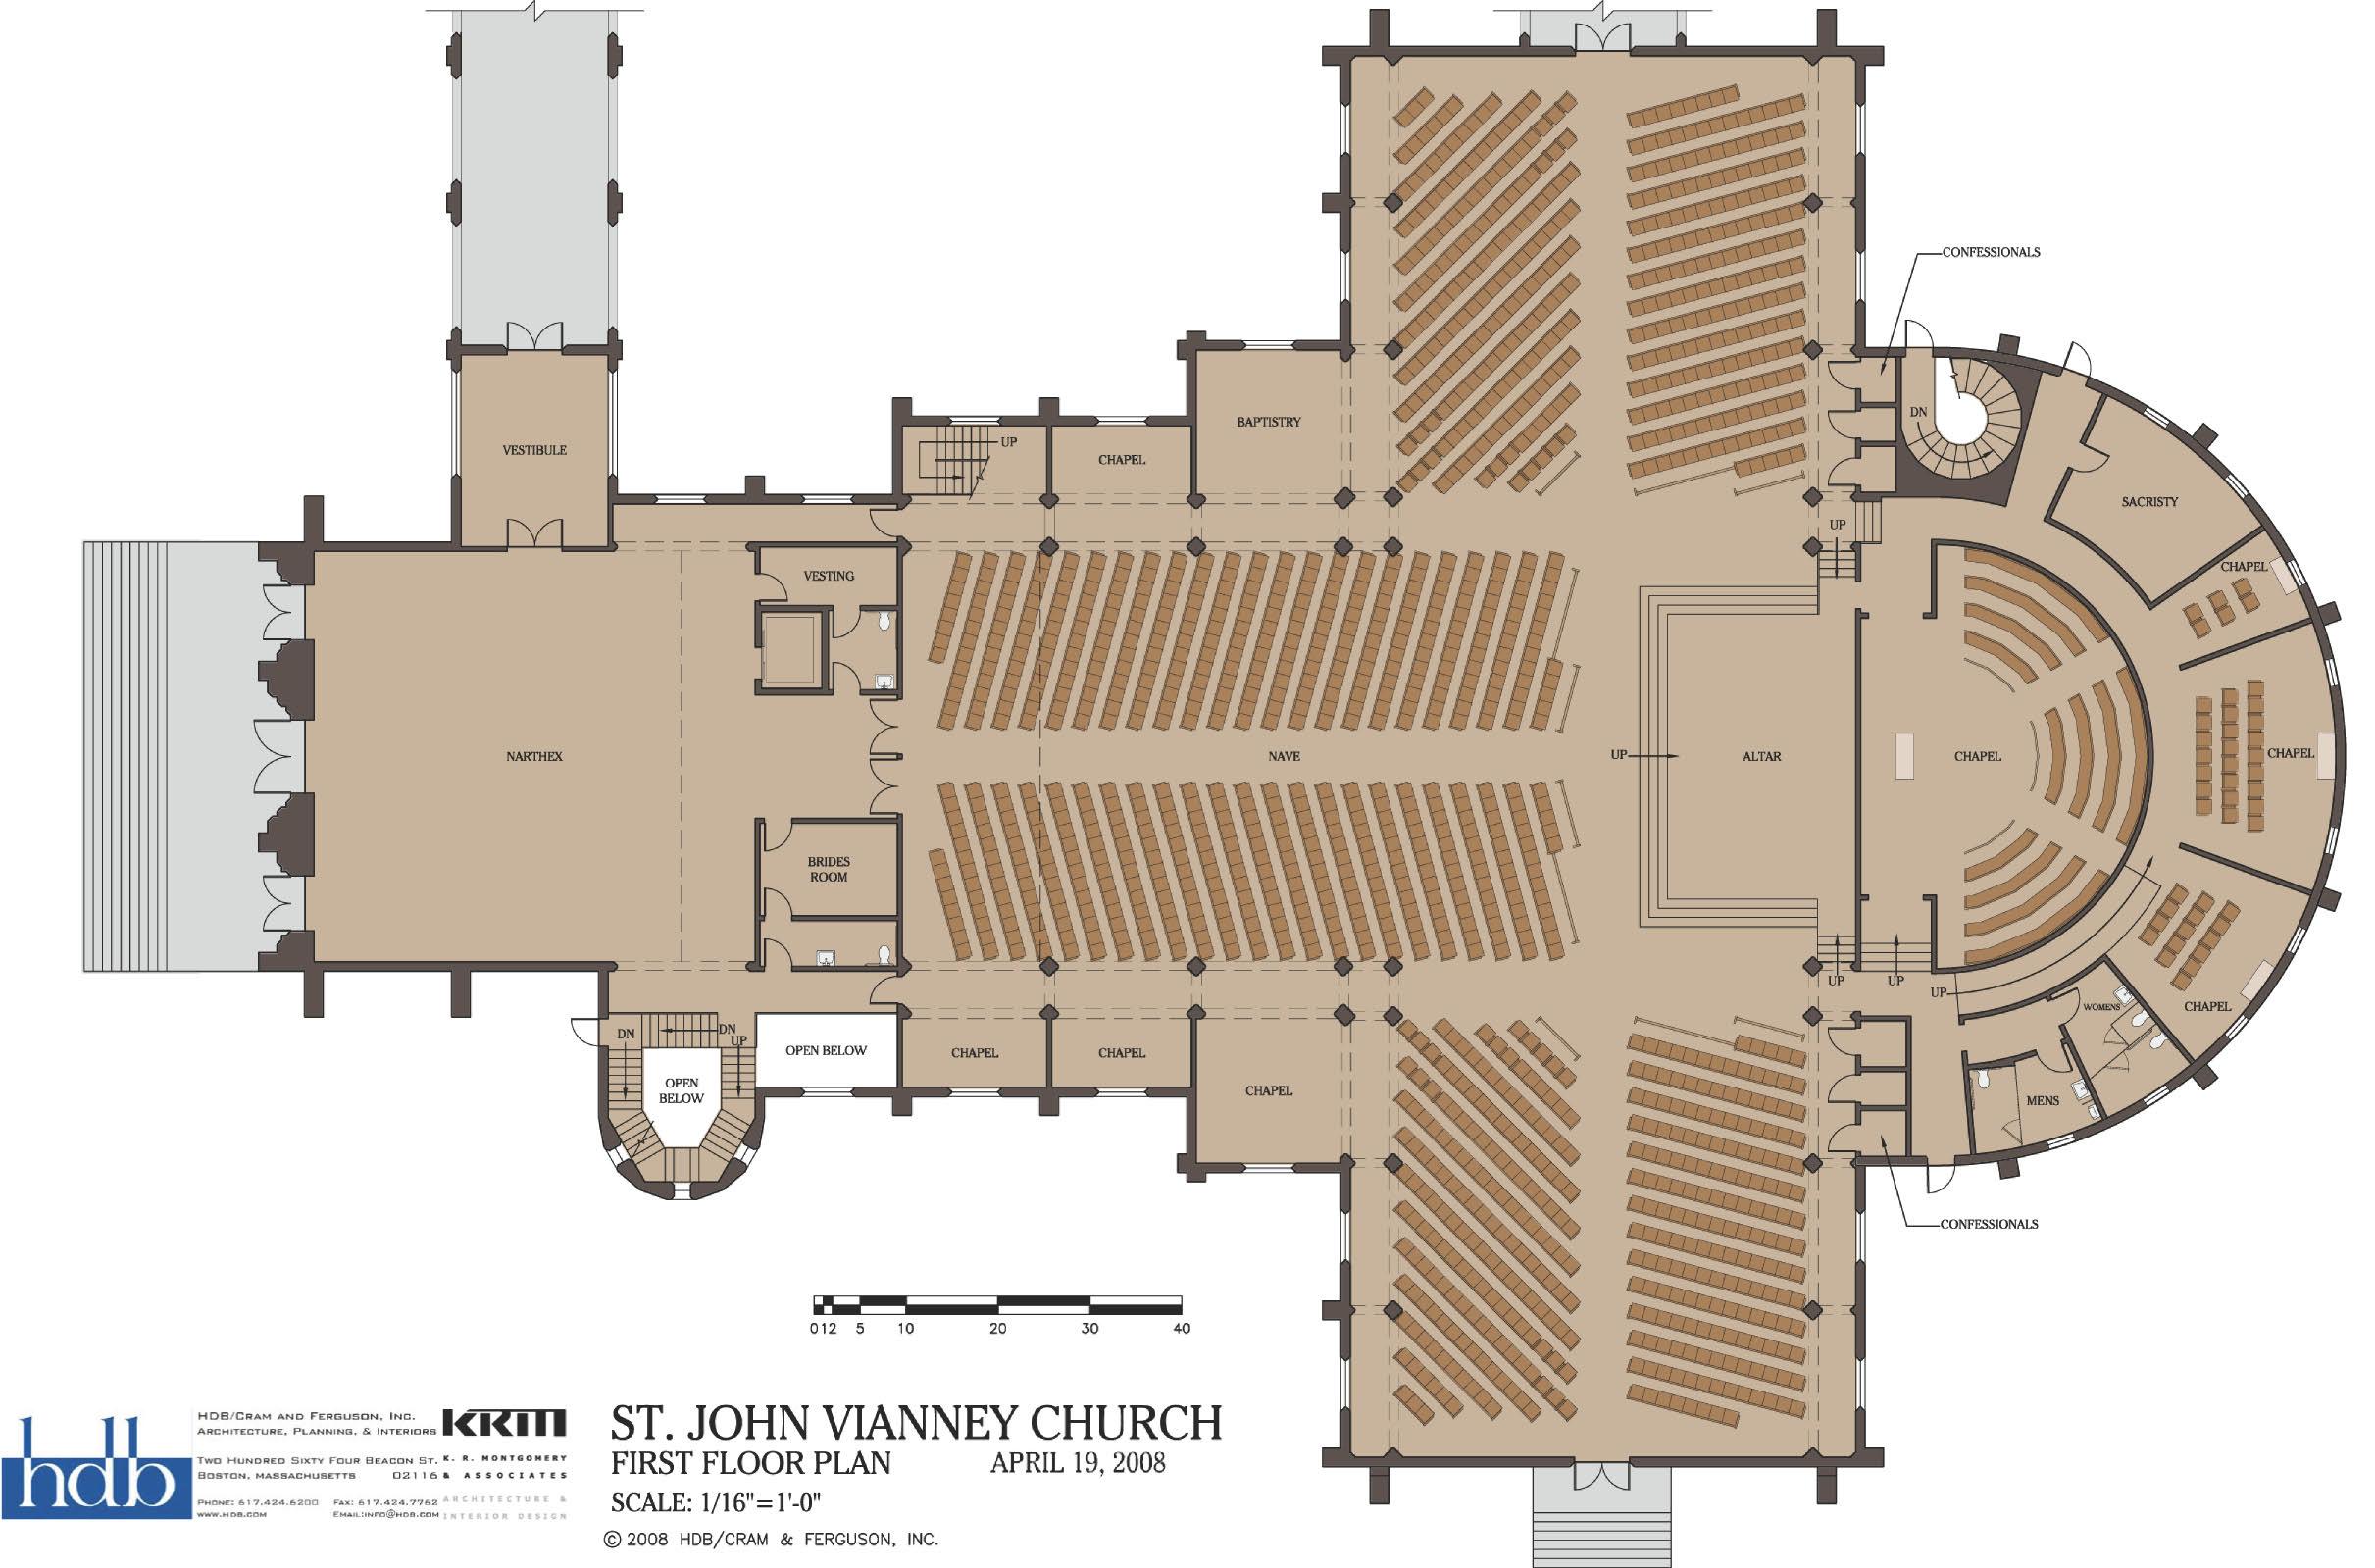 02 SJV Church 1st Floor.jpg